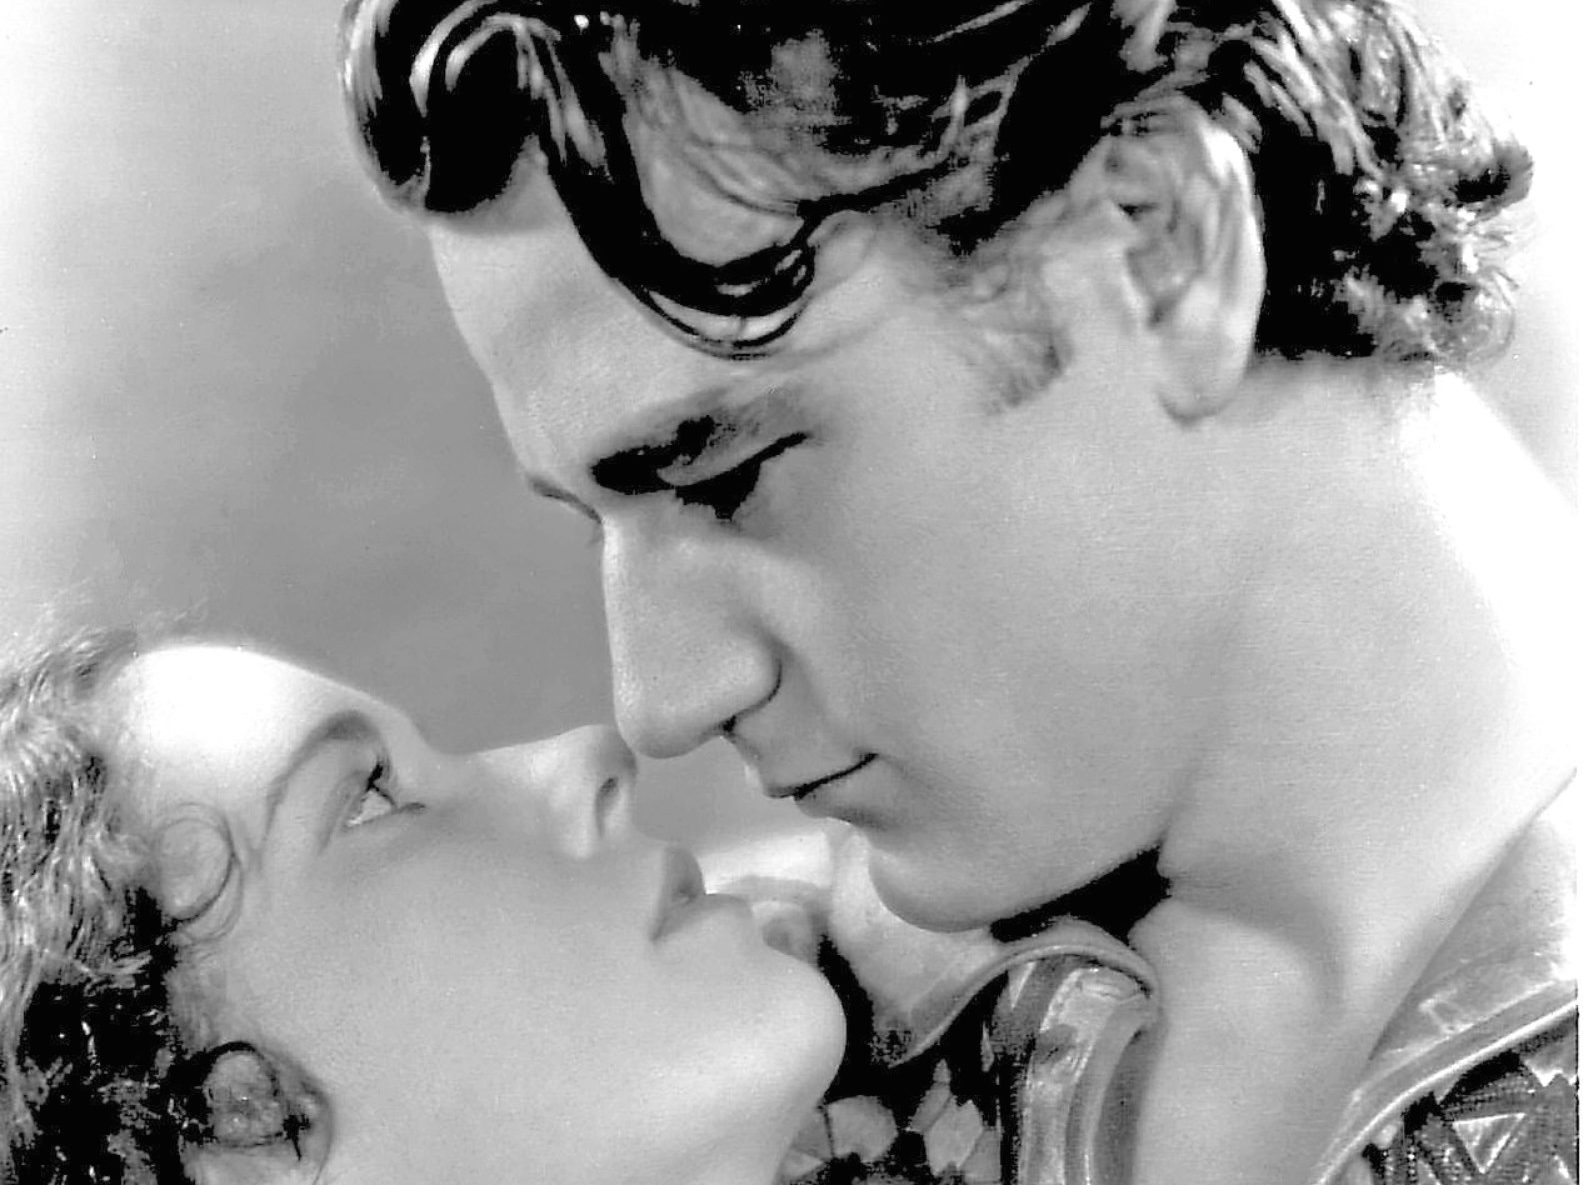 John Wayne and Marguerite Churchill in 1930 film The Big Trail (Allstar/FOX FILM CORPORATION)